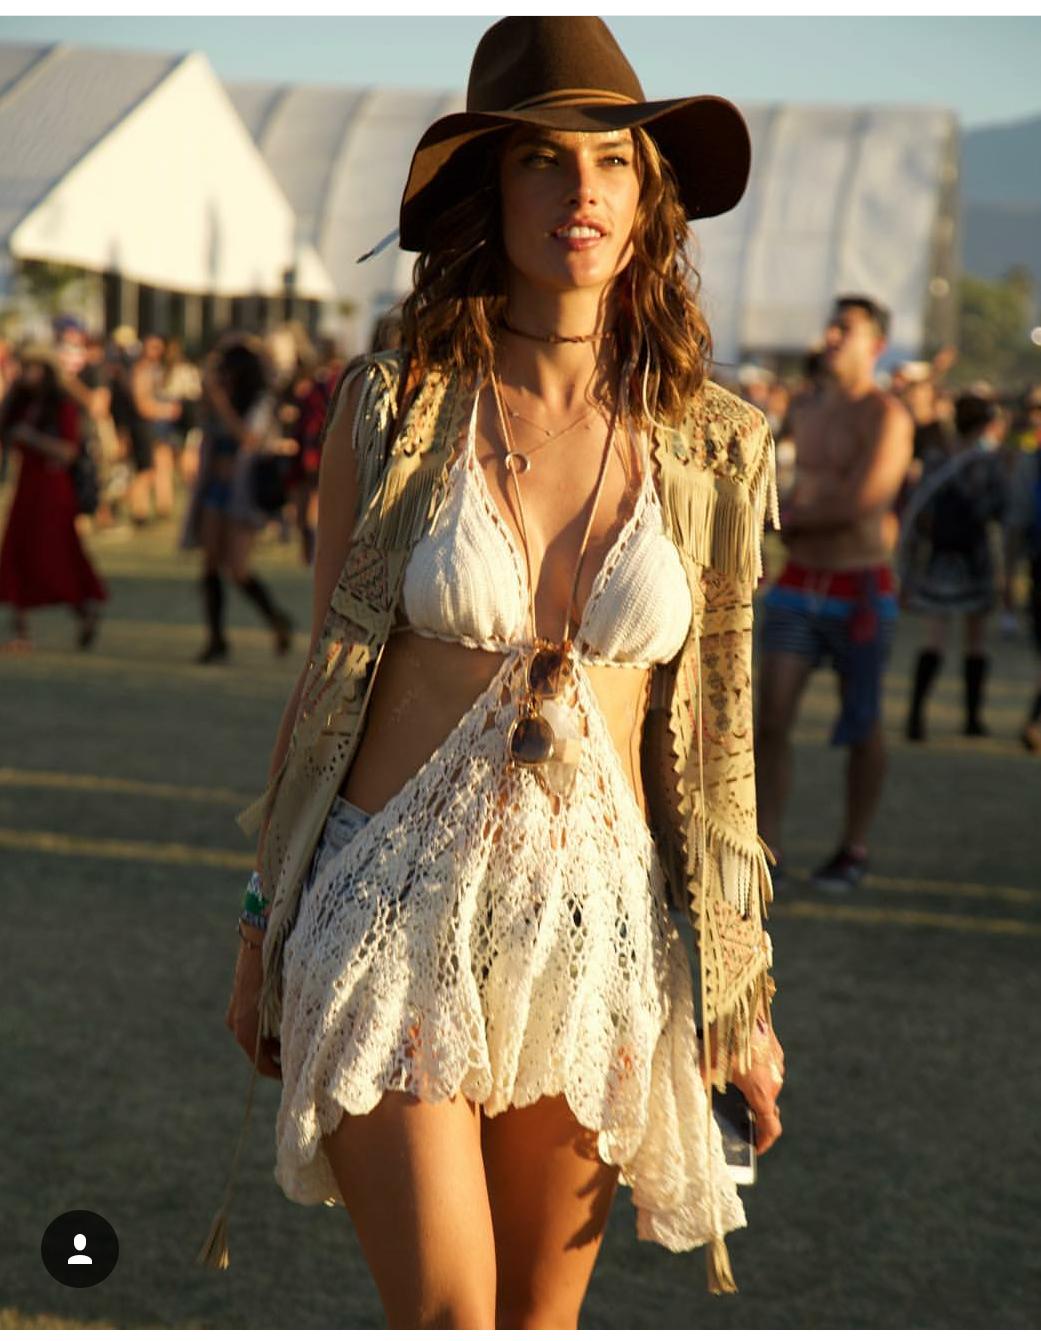 Festivalska moda - najzanimljivije s Coachelle